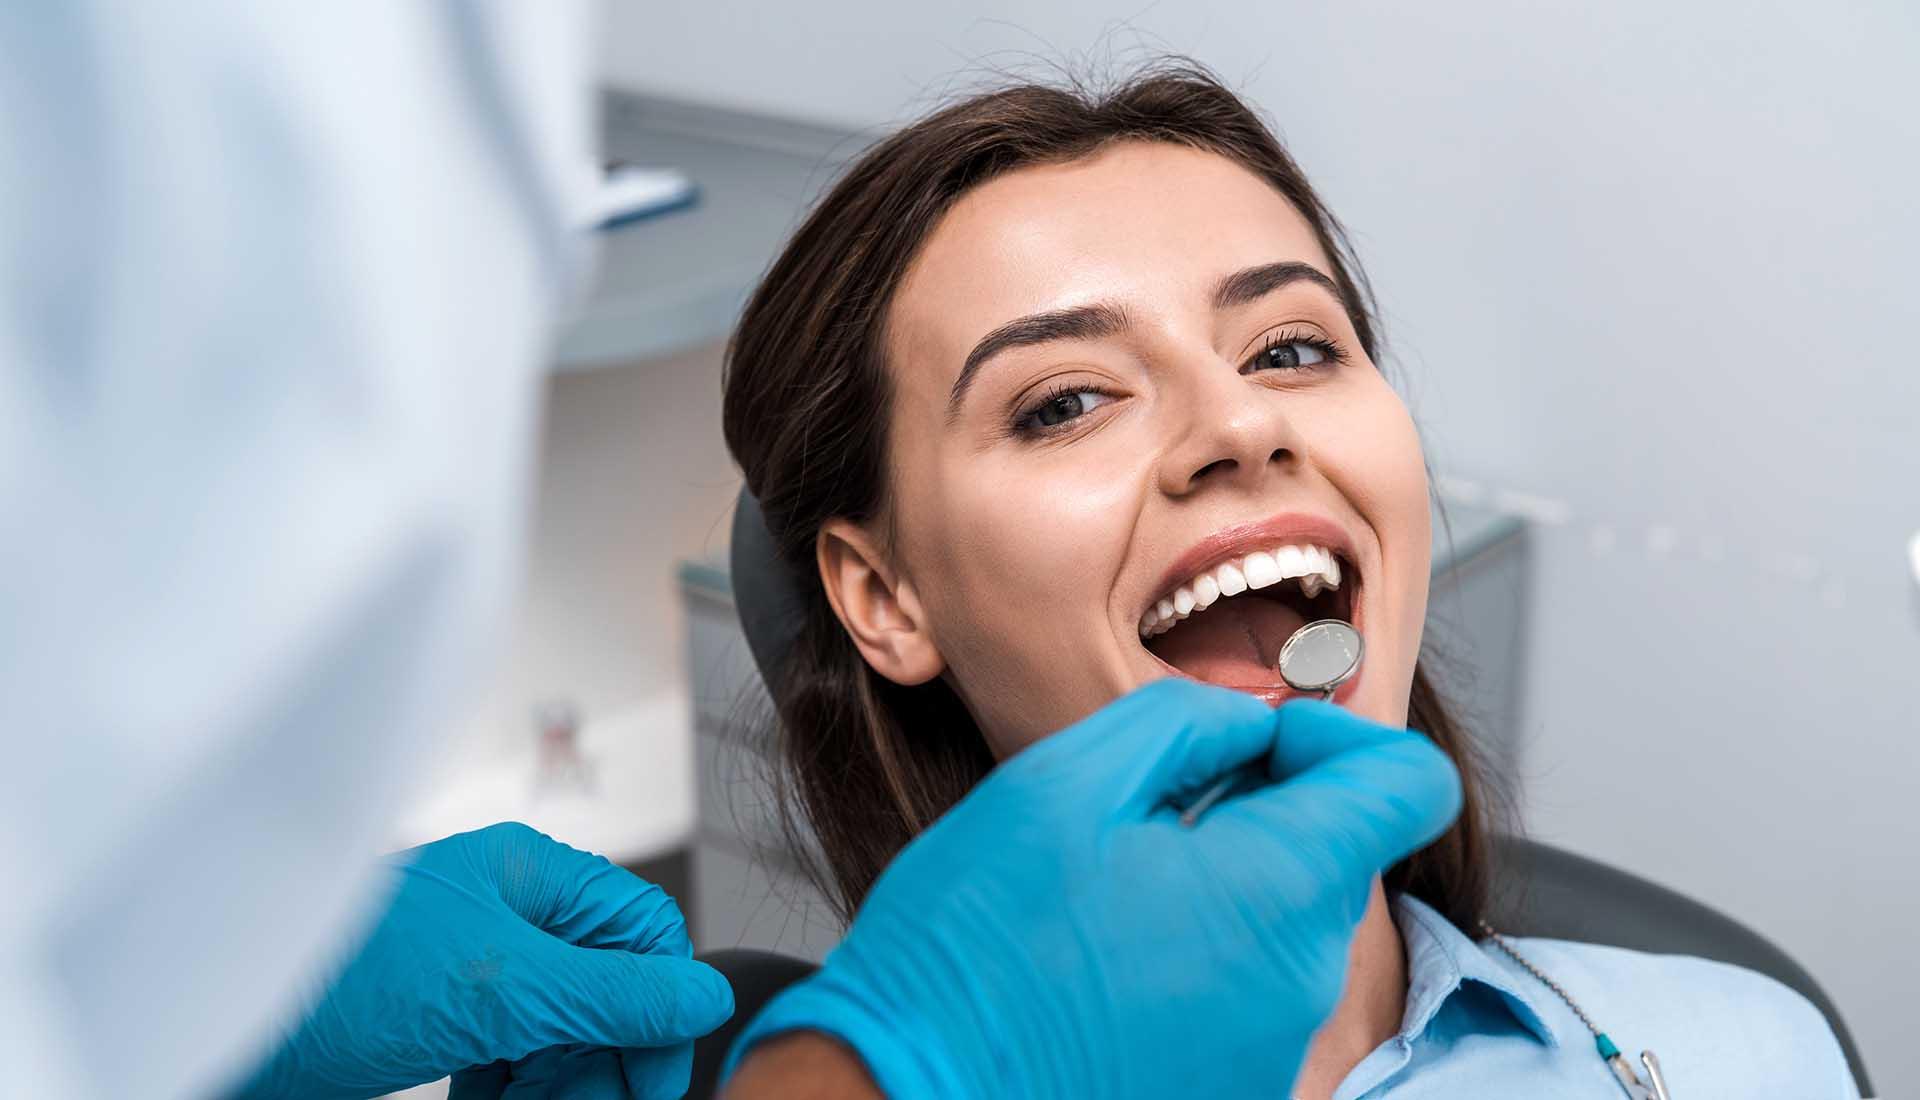 woman in a dental chair during a dental checkup